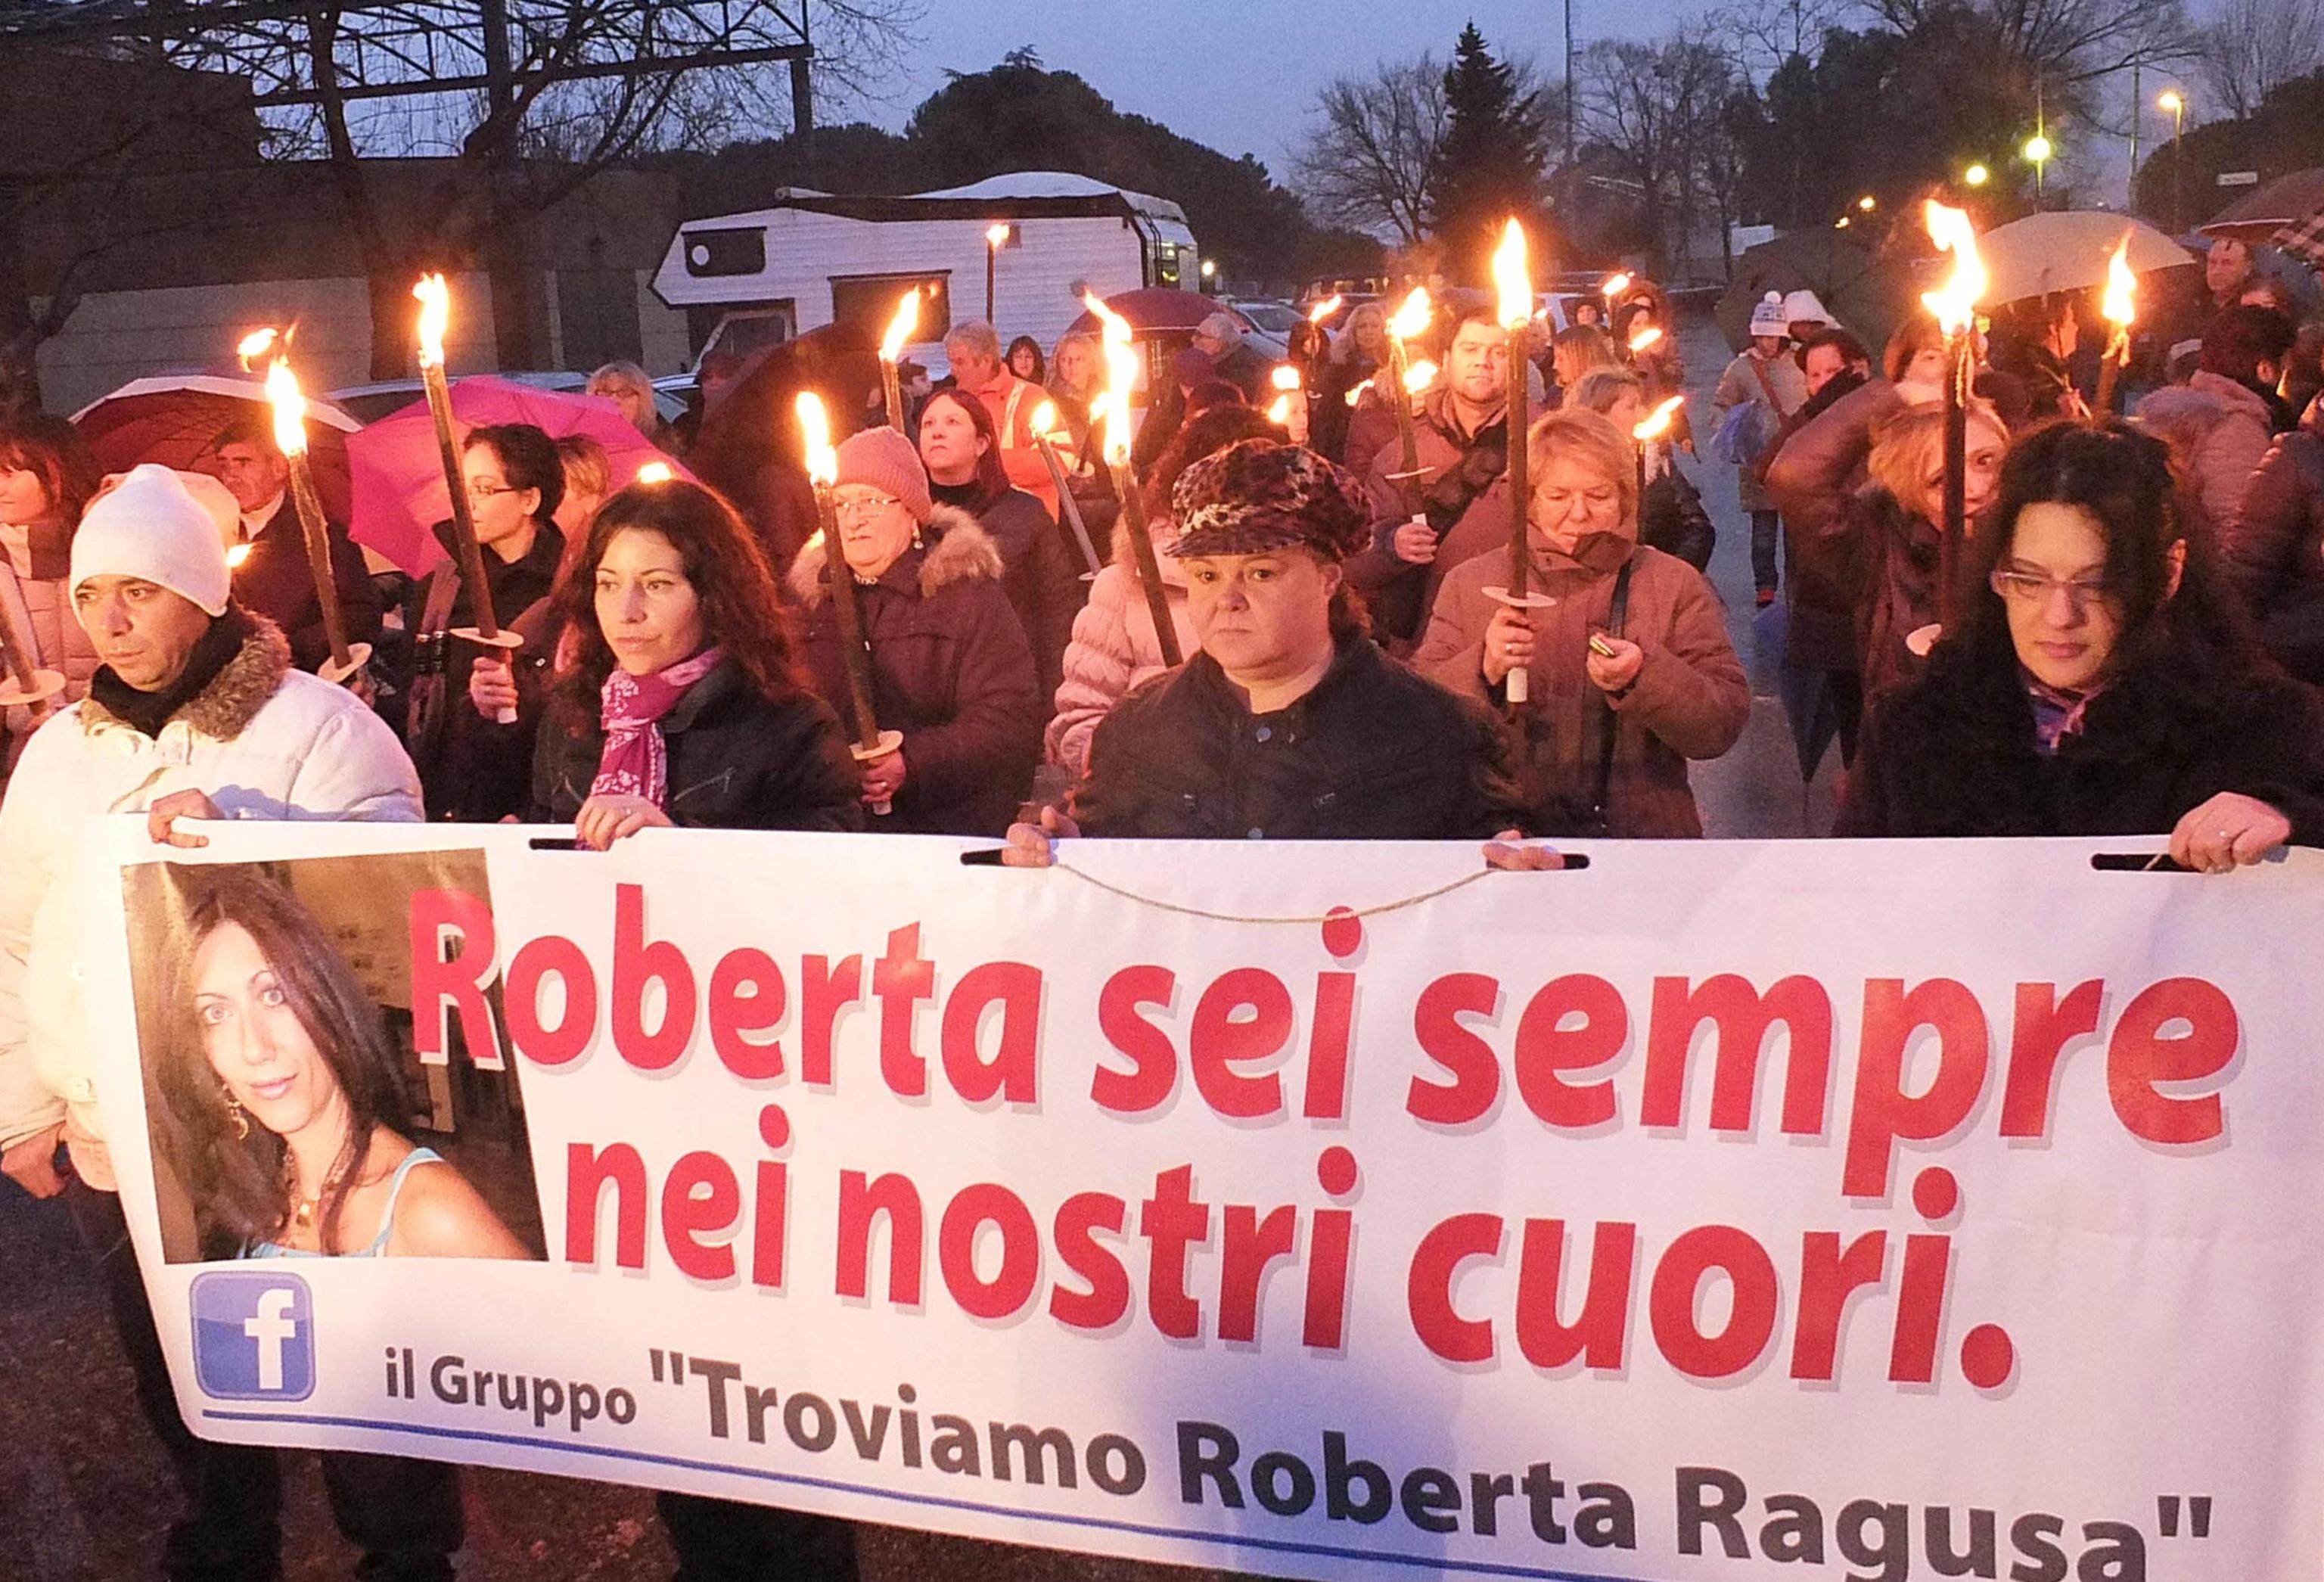 Roberta-Ragusa-processo-Antonio-Logli